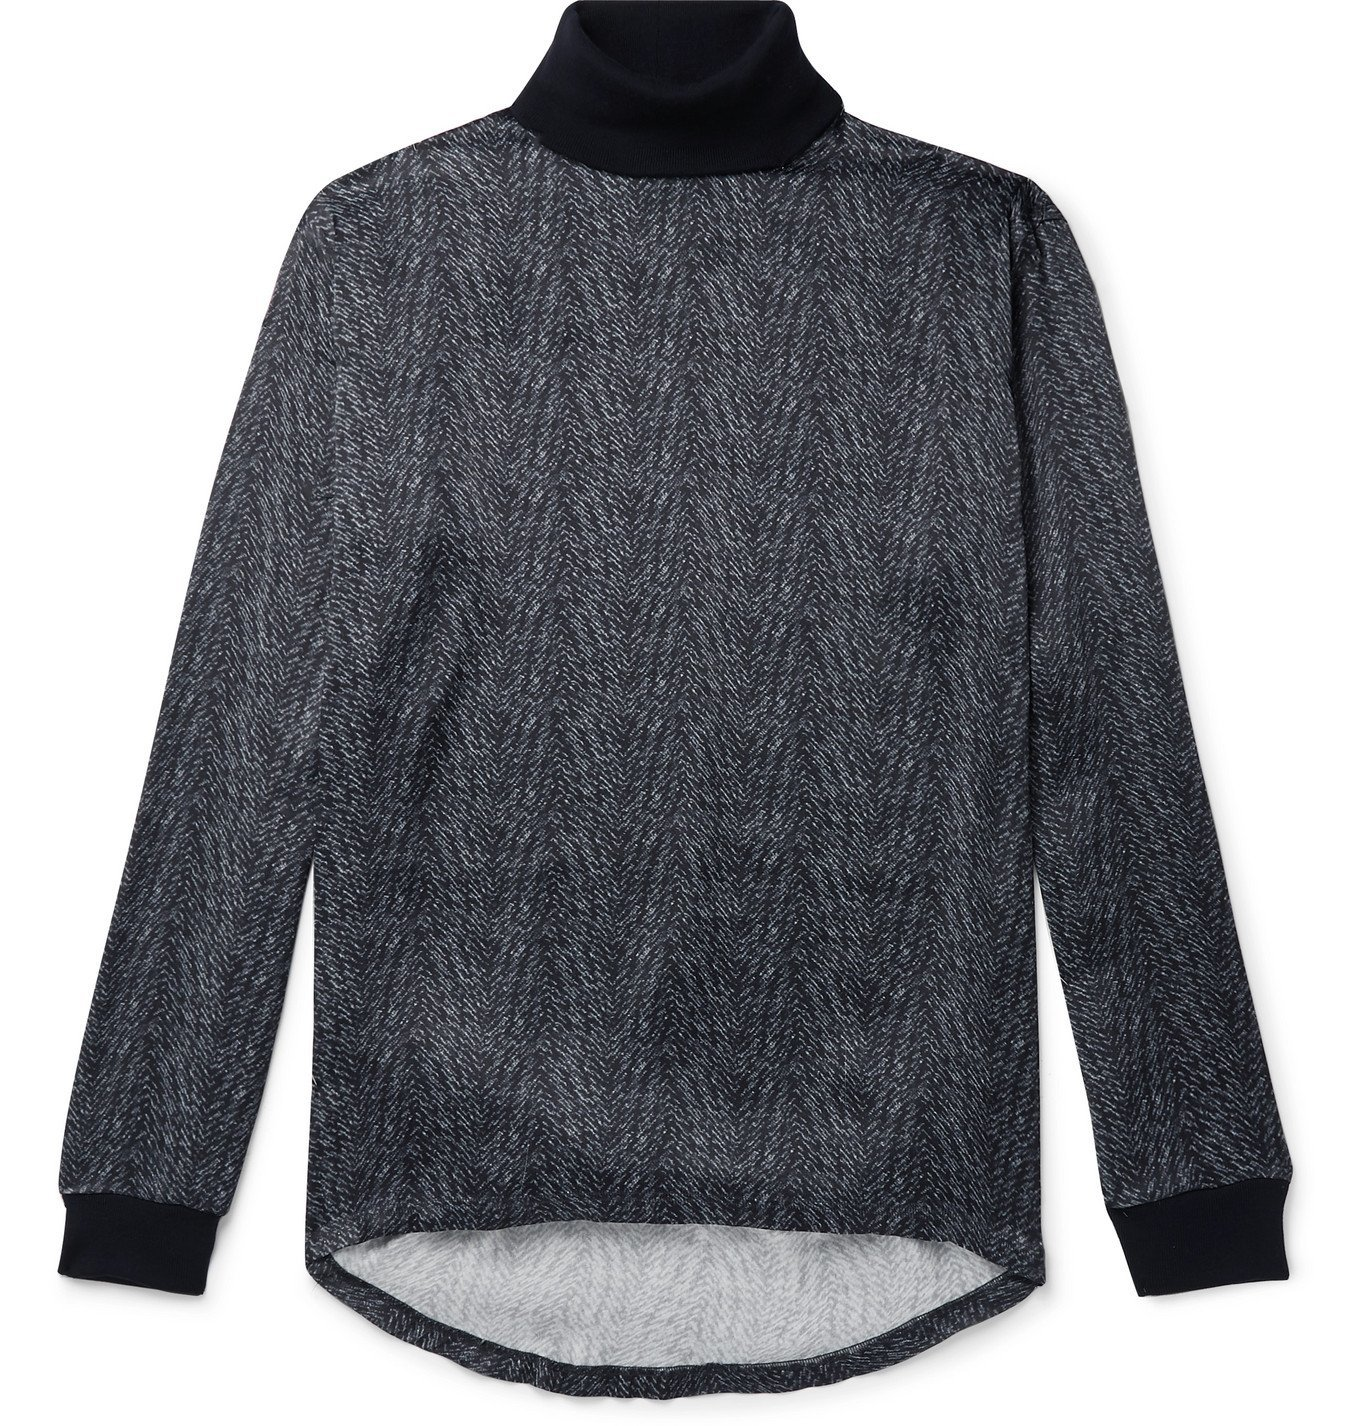 Giorgio Armani - Printed Satin and Virgin Wool Rollneck Sweater - Blue